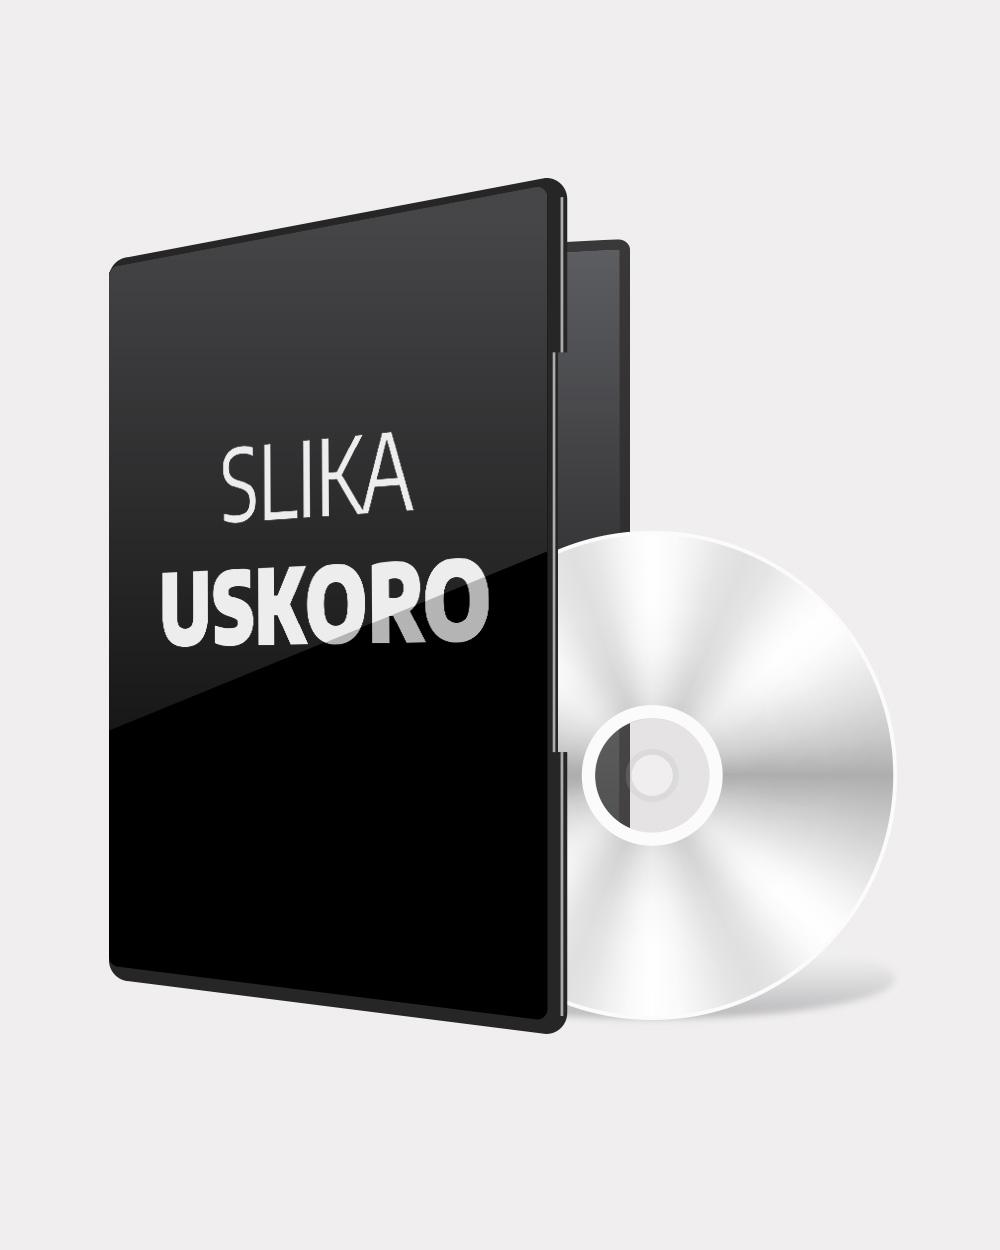 PCG Cuban Missile Crisis Ice Crusade